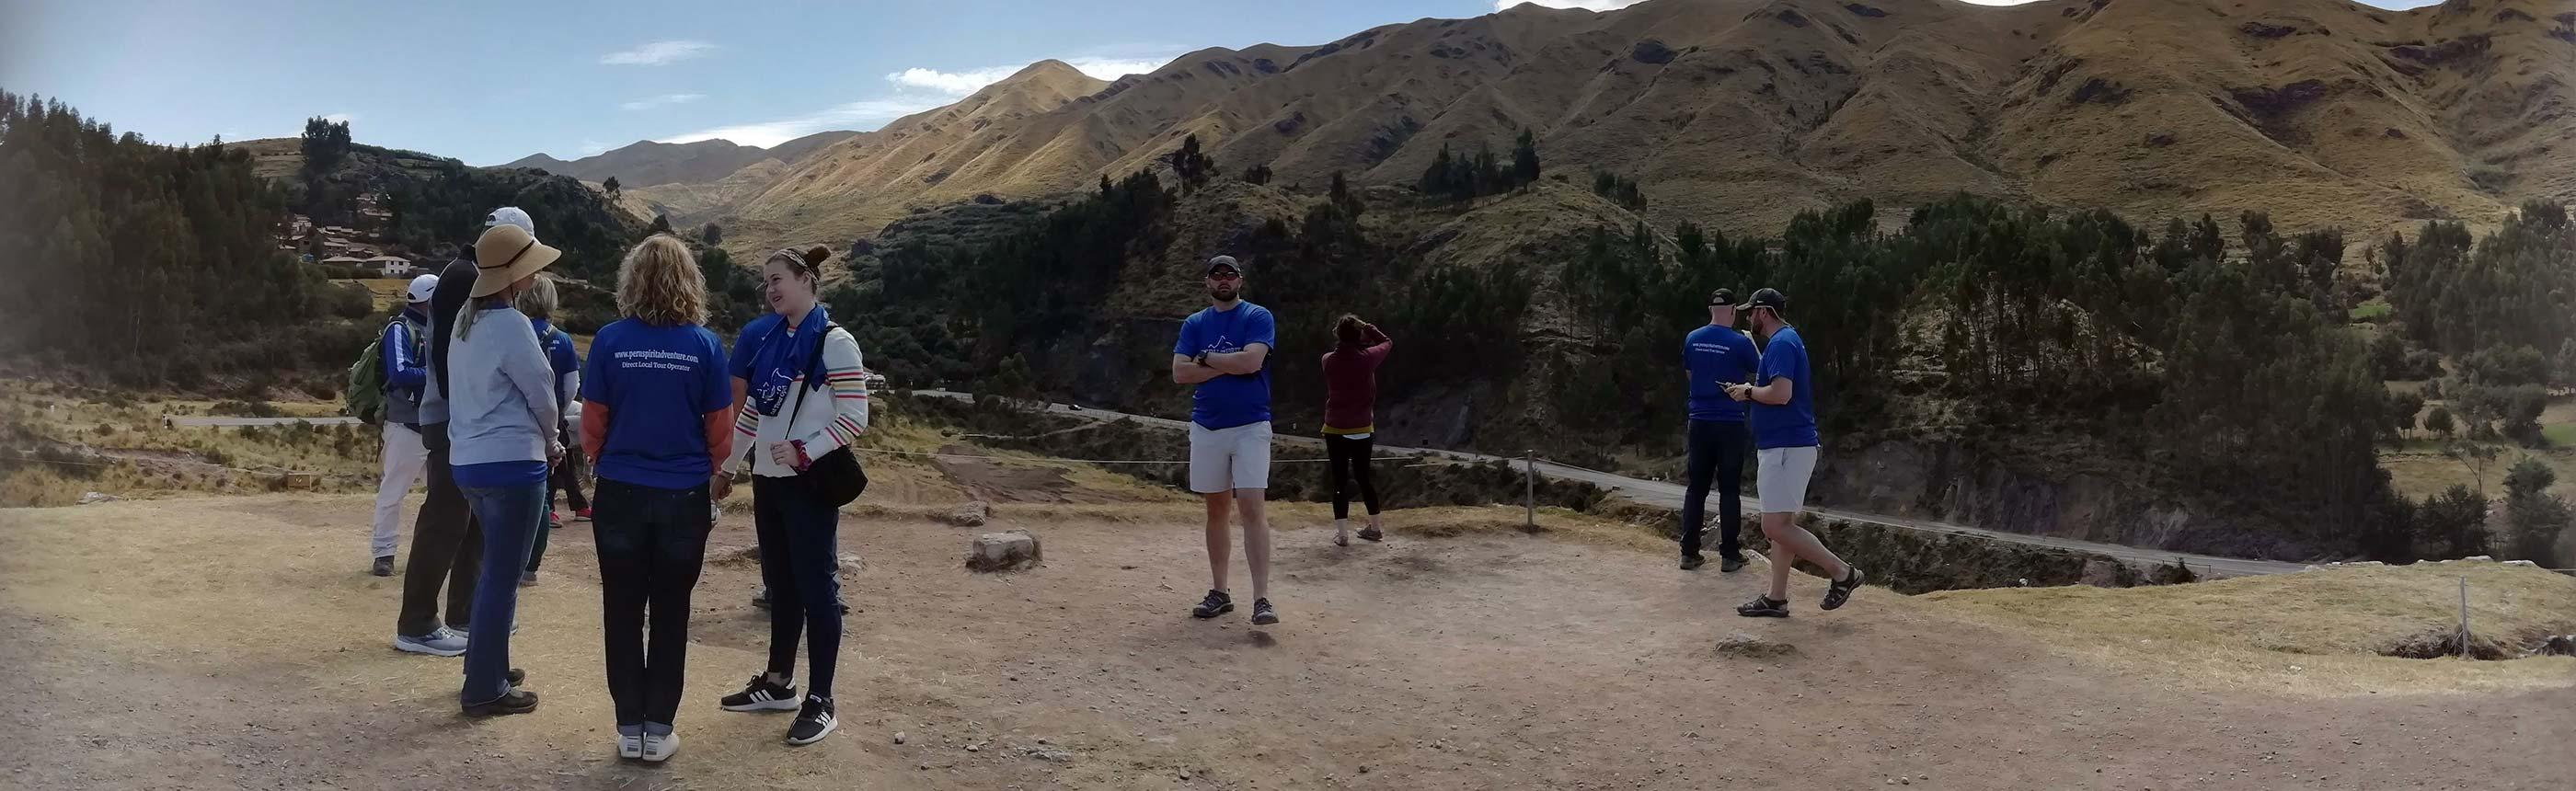 Horseback Riding Cusco